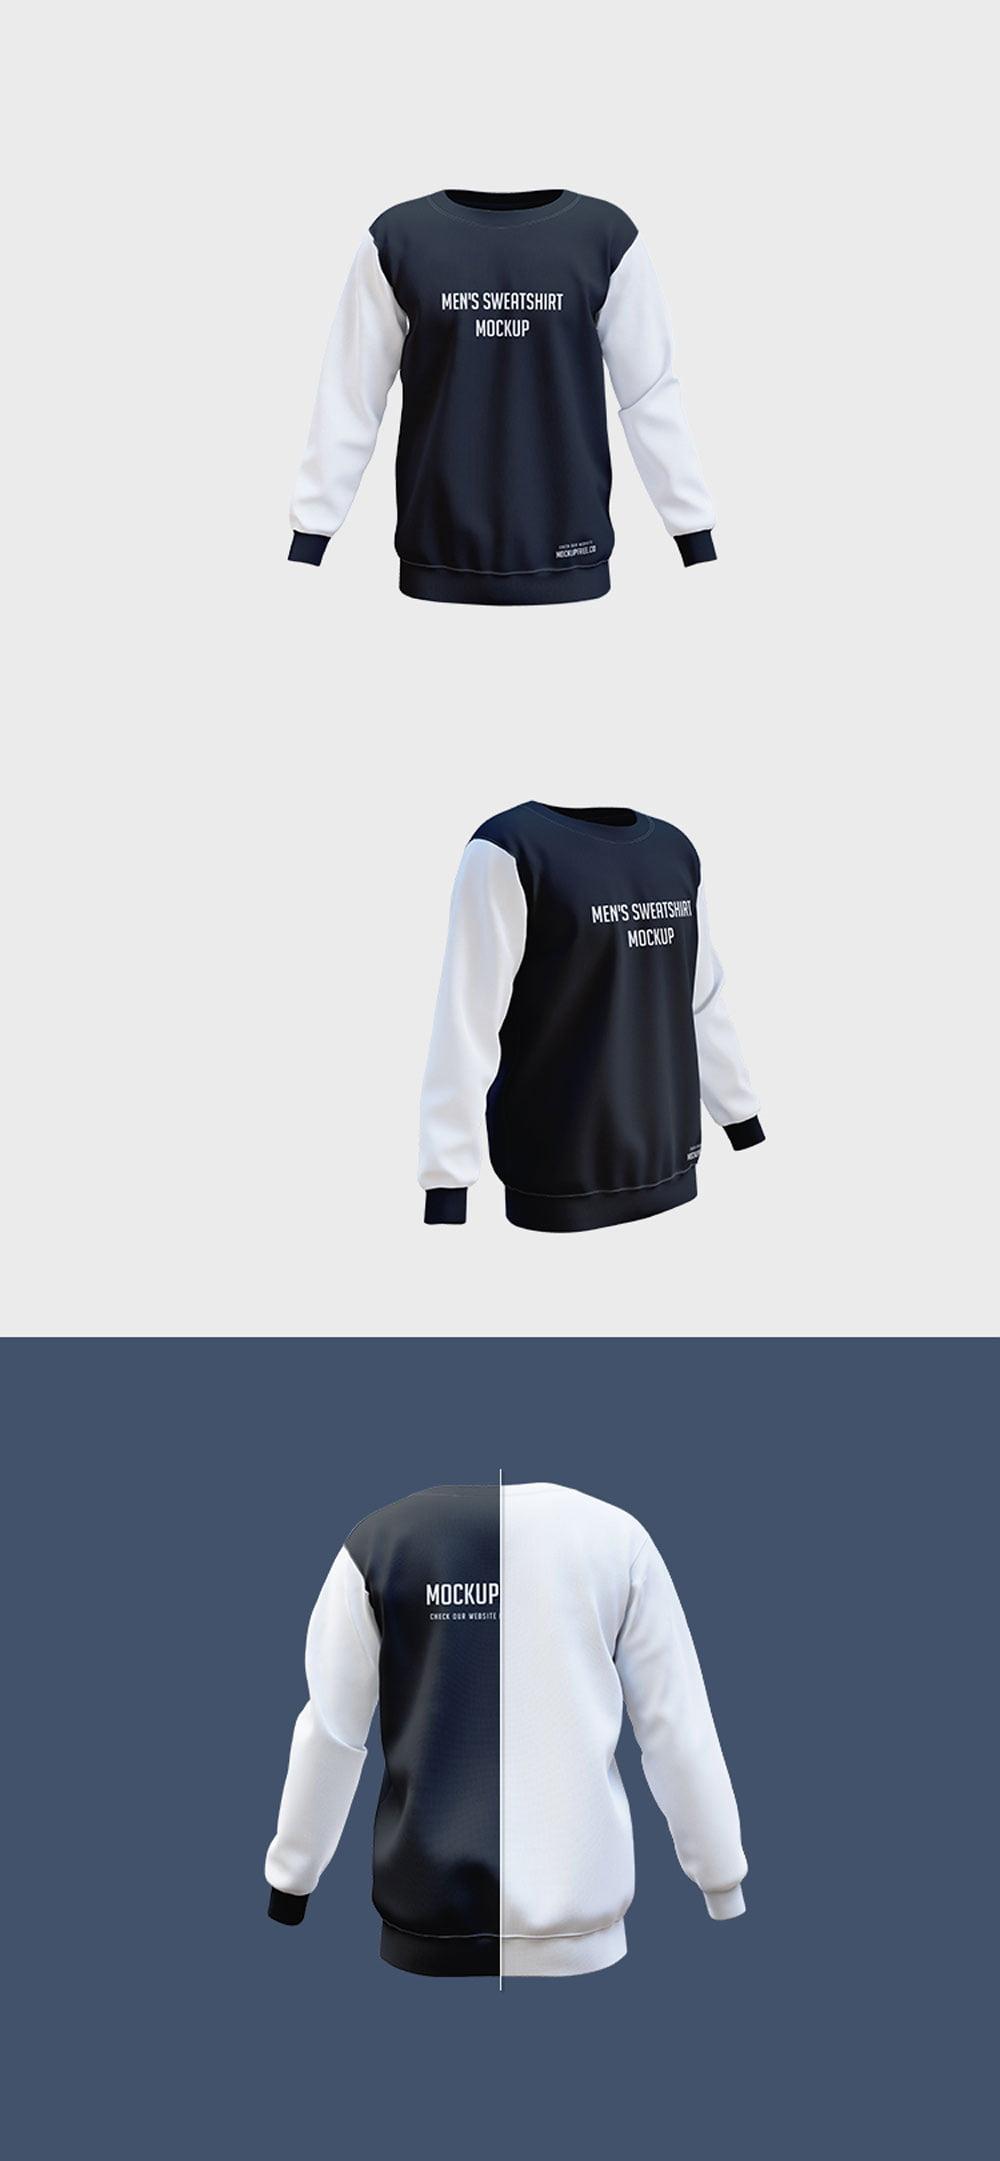 Free Men's Sweatshirt Mockup